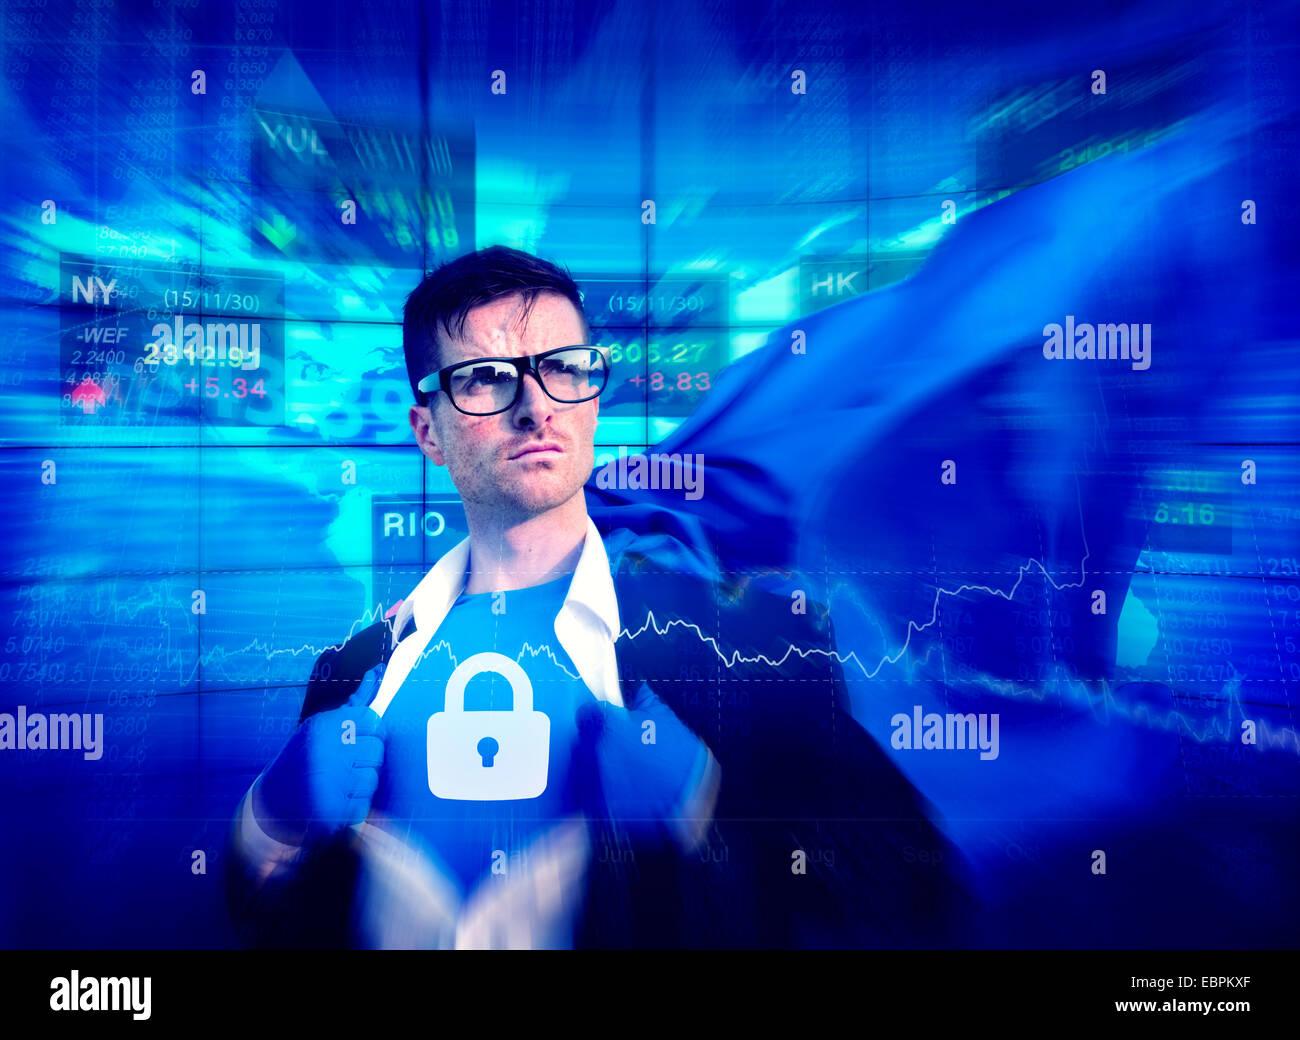 Starke Superhelden Erfolg professionelle Empowerment Lager Datenschutzkonzept Stockbild